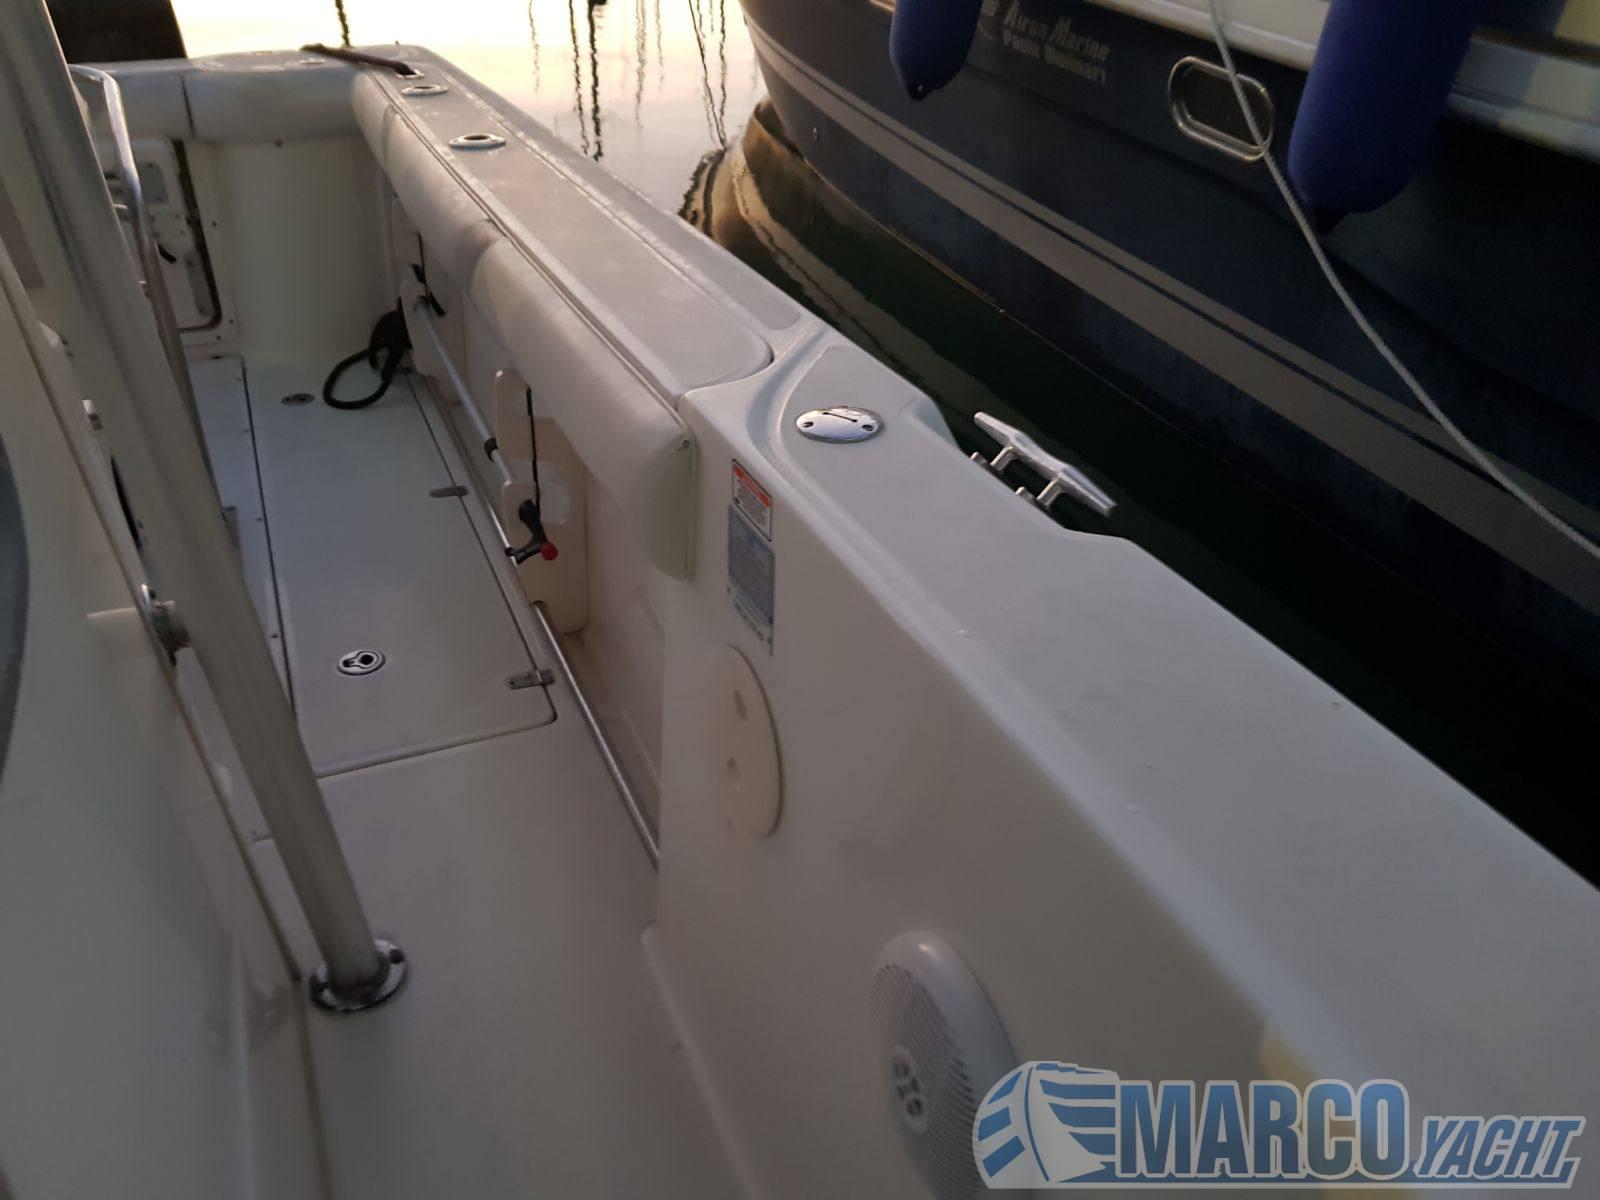 Boston Whaler Outrage 270 barco a motor